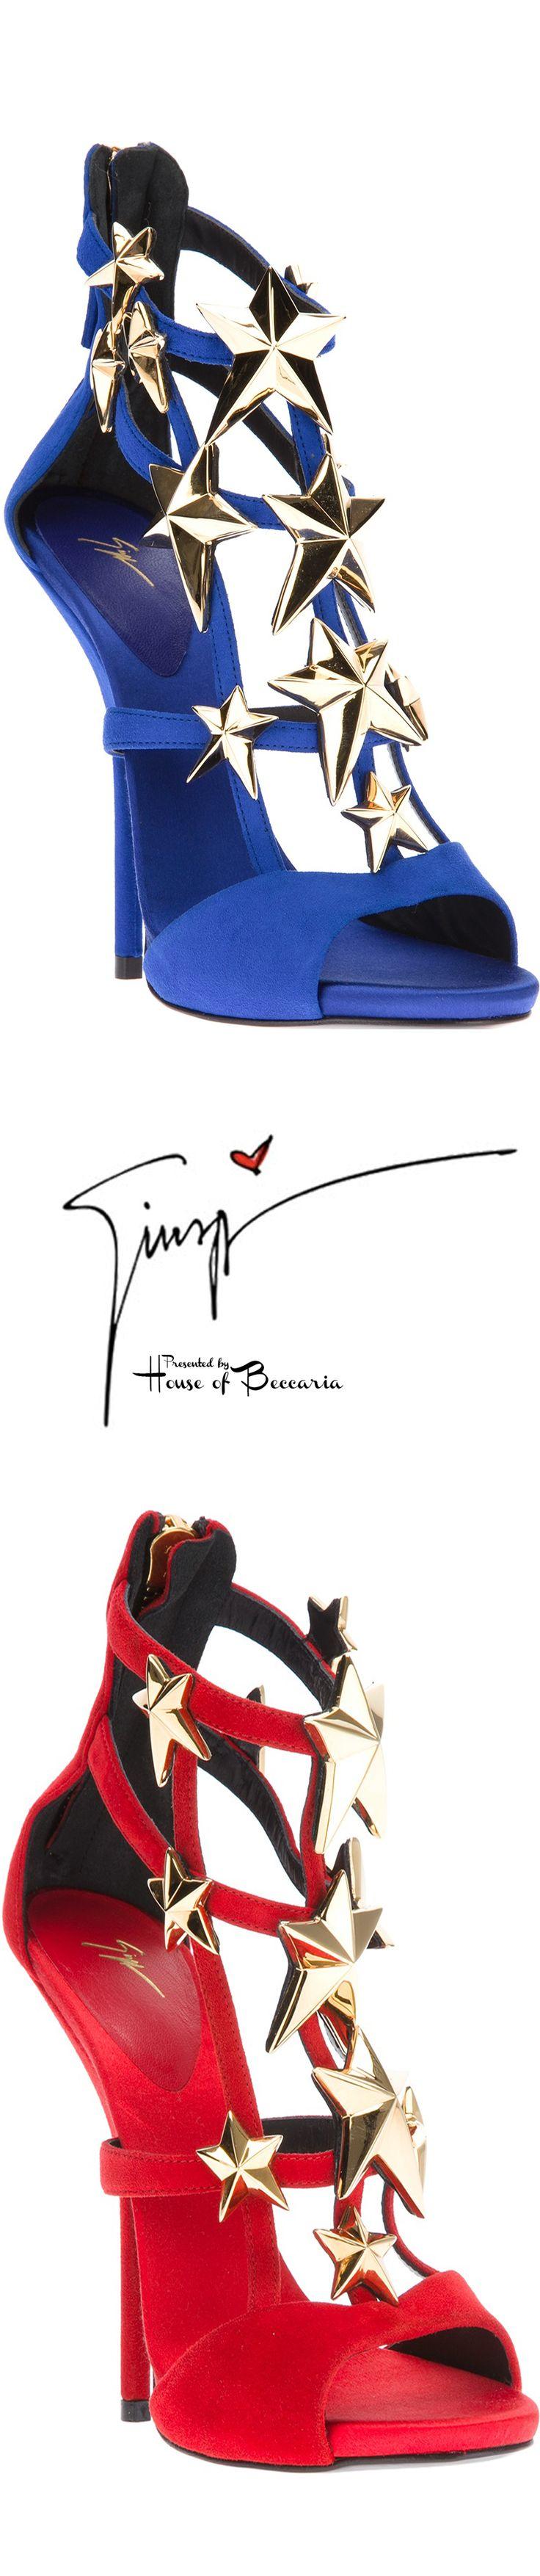 ~Giuseppe Zanotti 2013 Star Suede Stiletto Sandal | House of Beccaria#